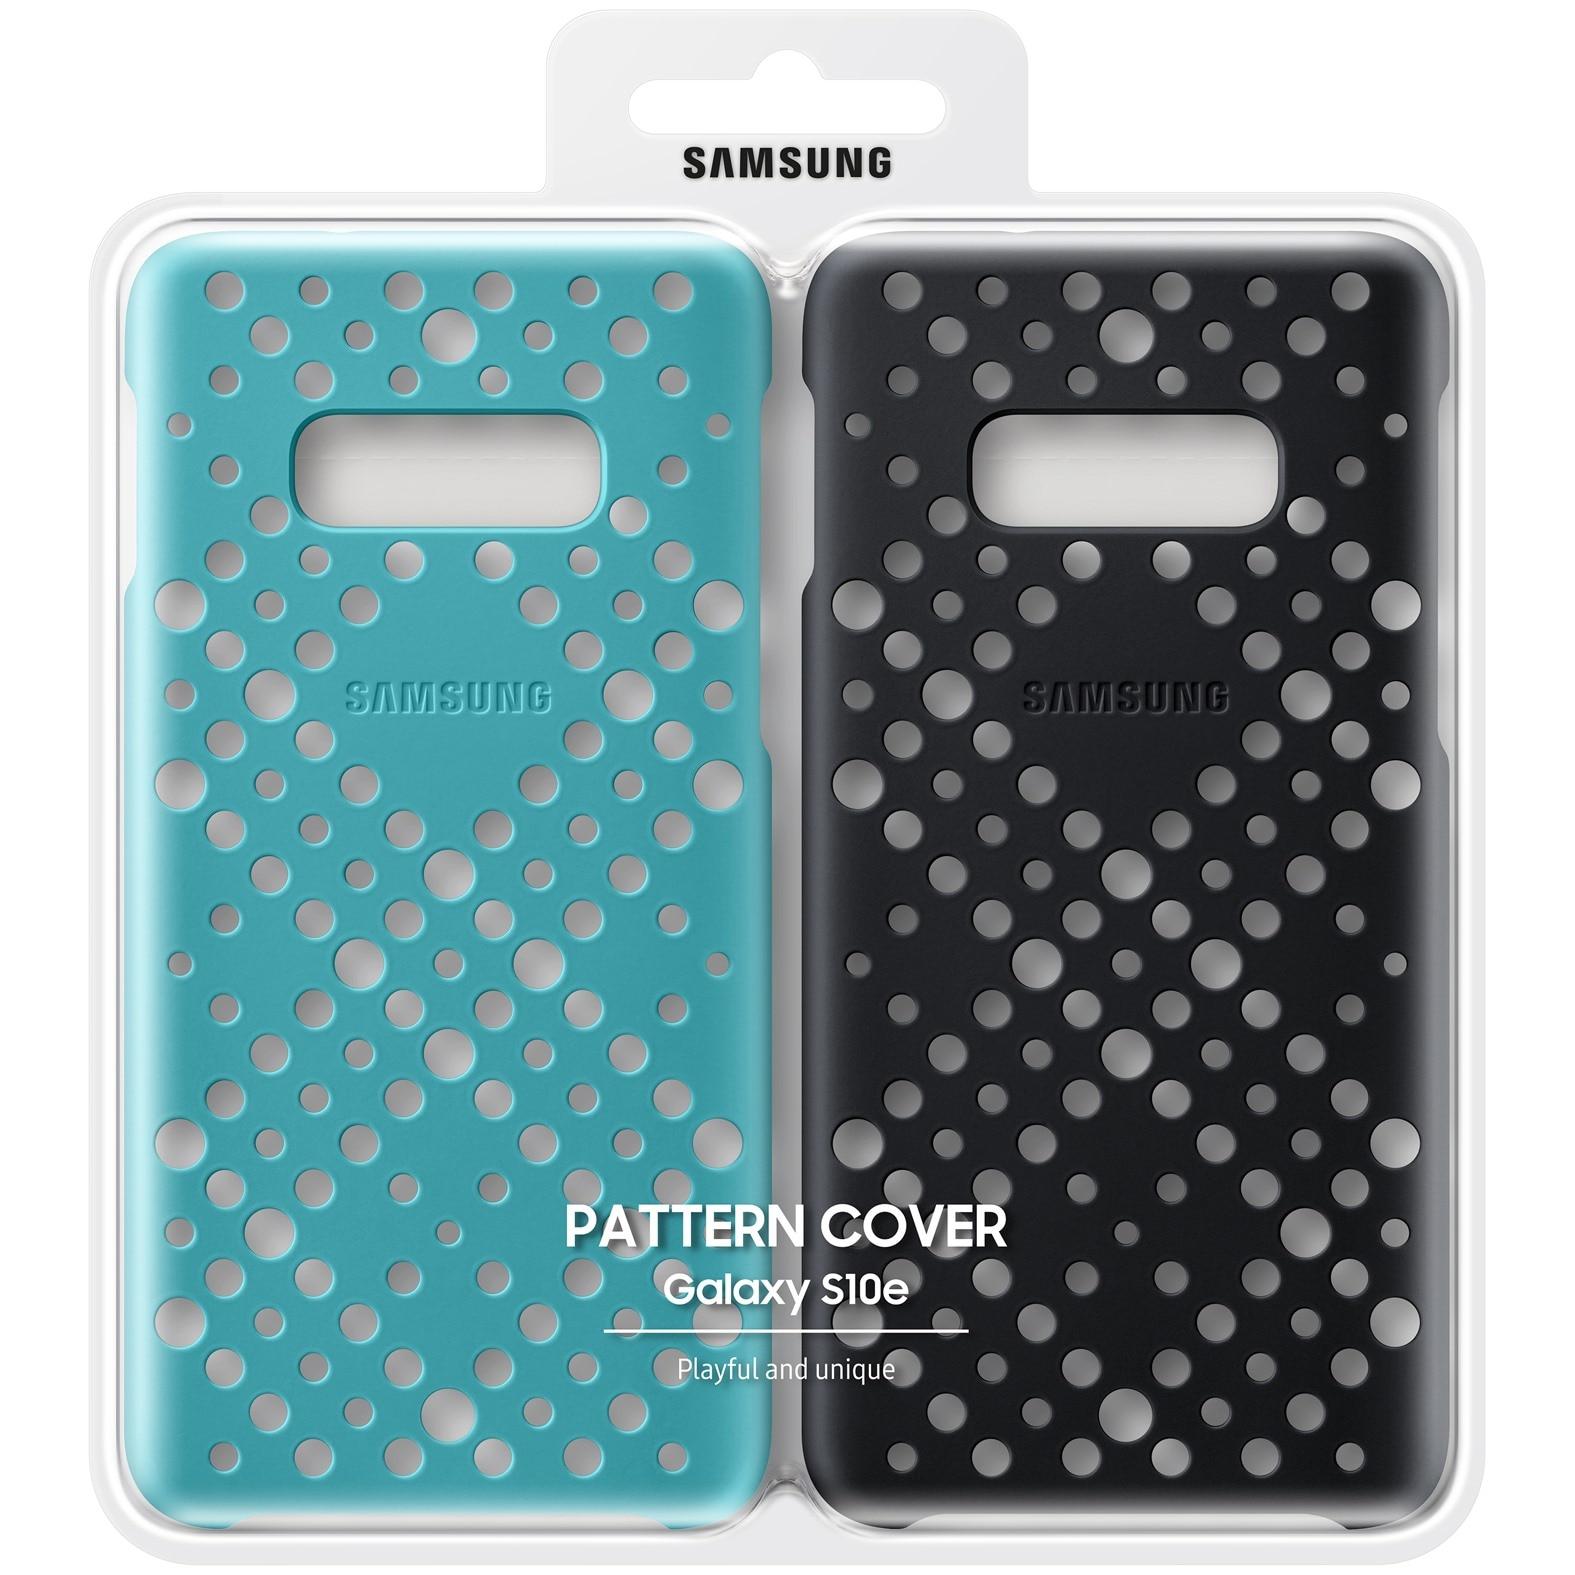 Fotografie Husa de protectie Samsung Pattern (Twin pack) pentru Galaxy S10e G970, Black/Green